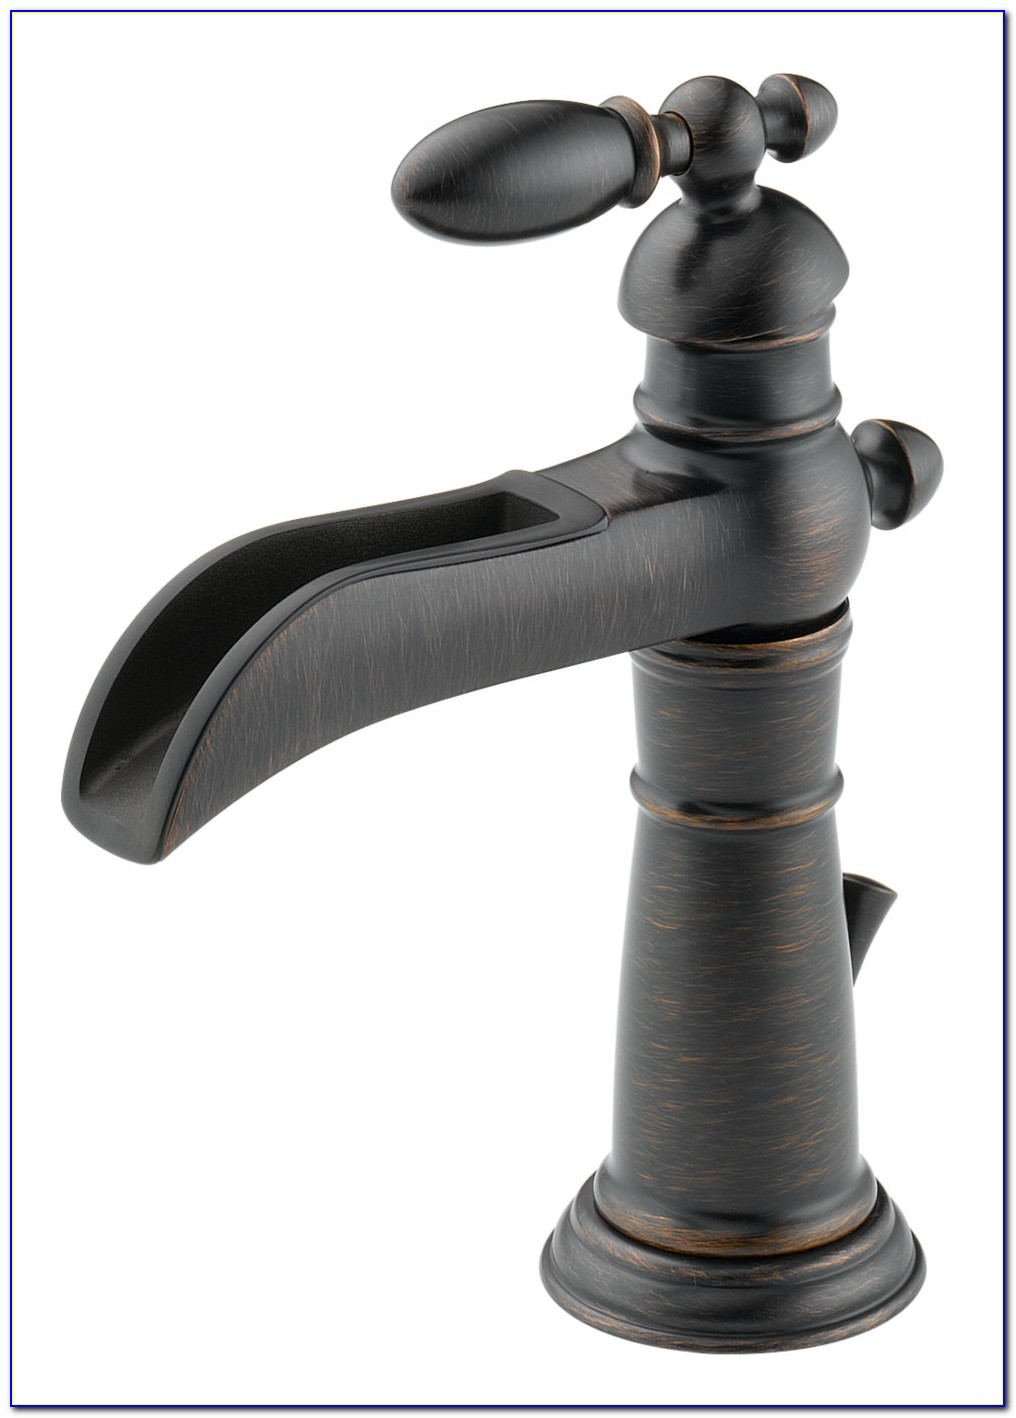 Antique Bronze Bathroom Sink Faucet